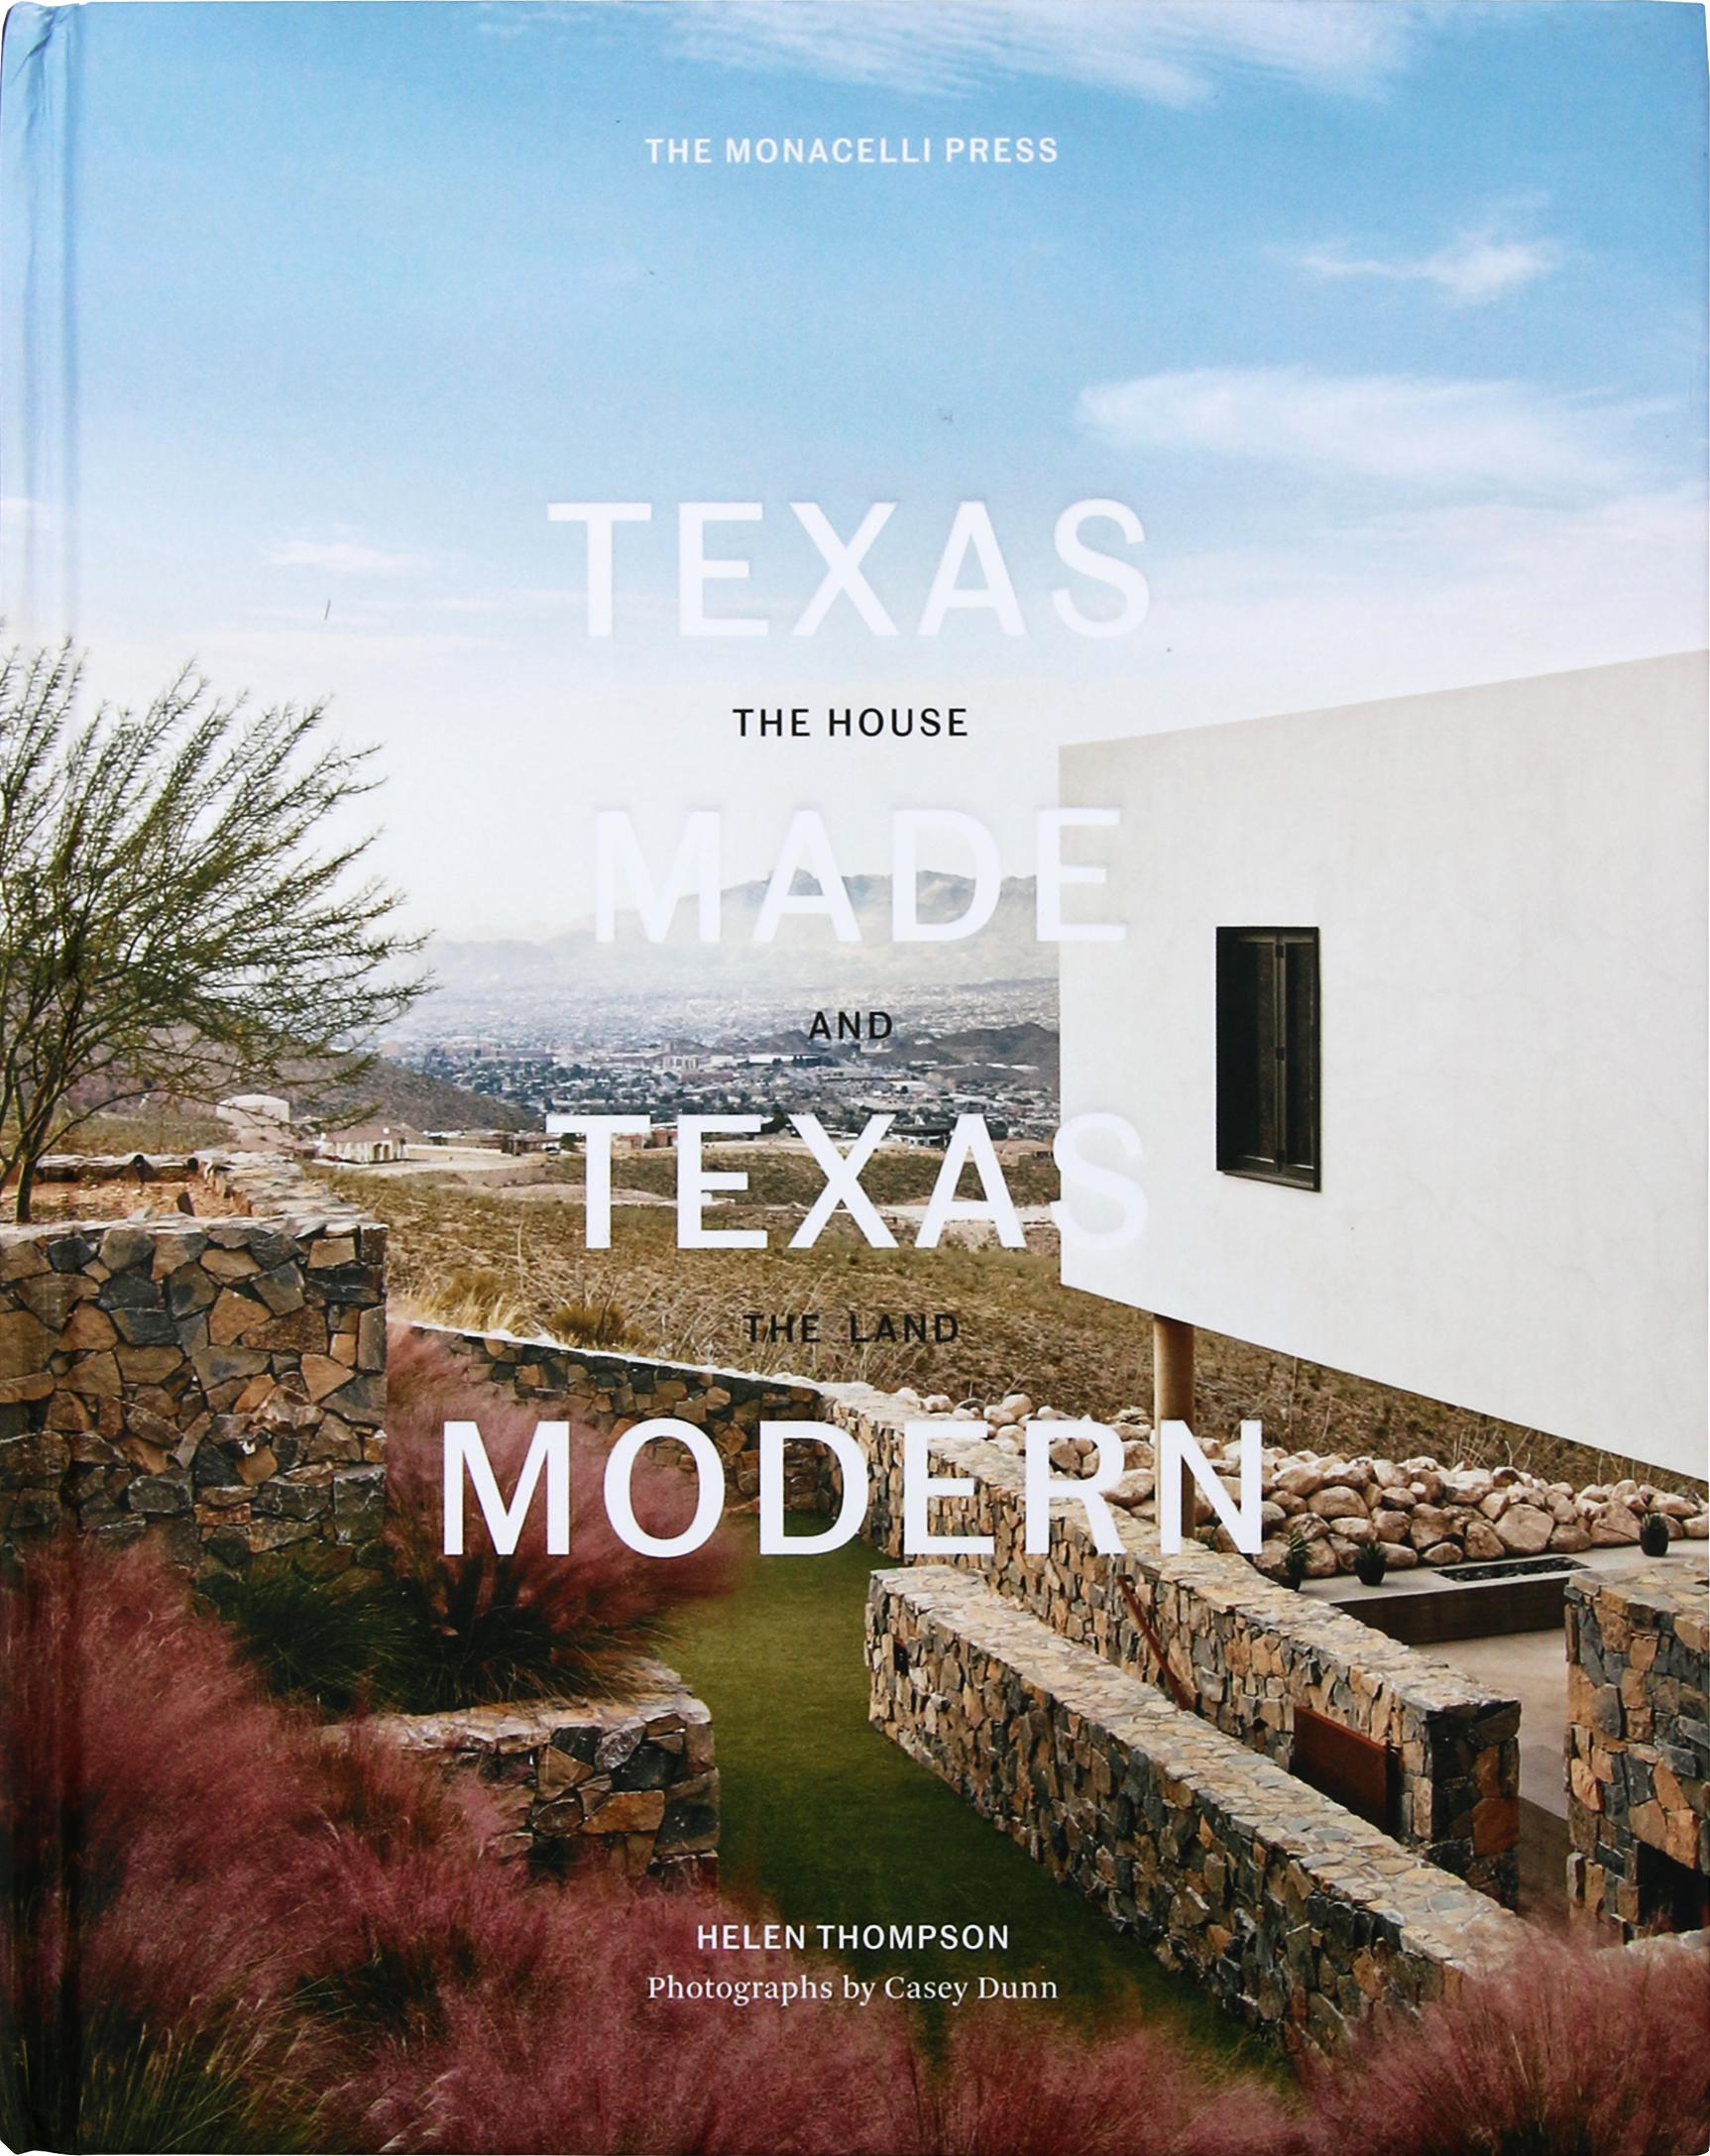 texas made texas modern.jpg